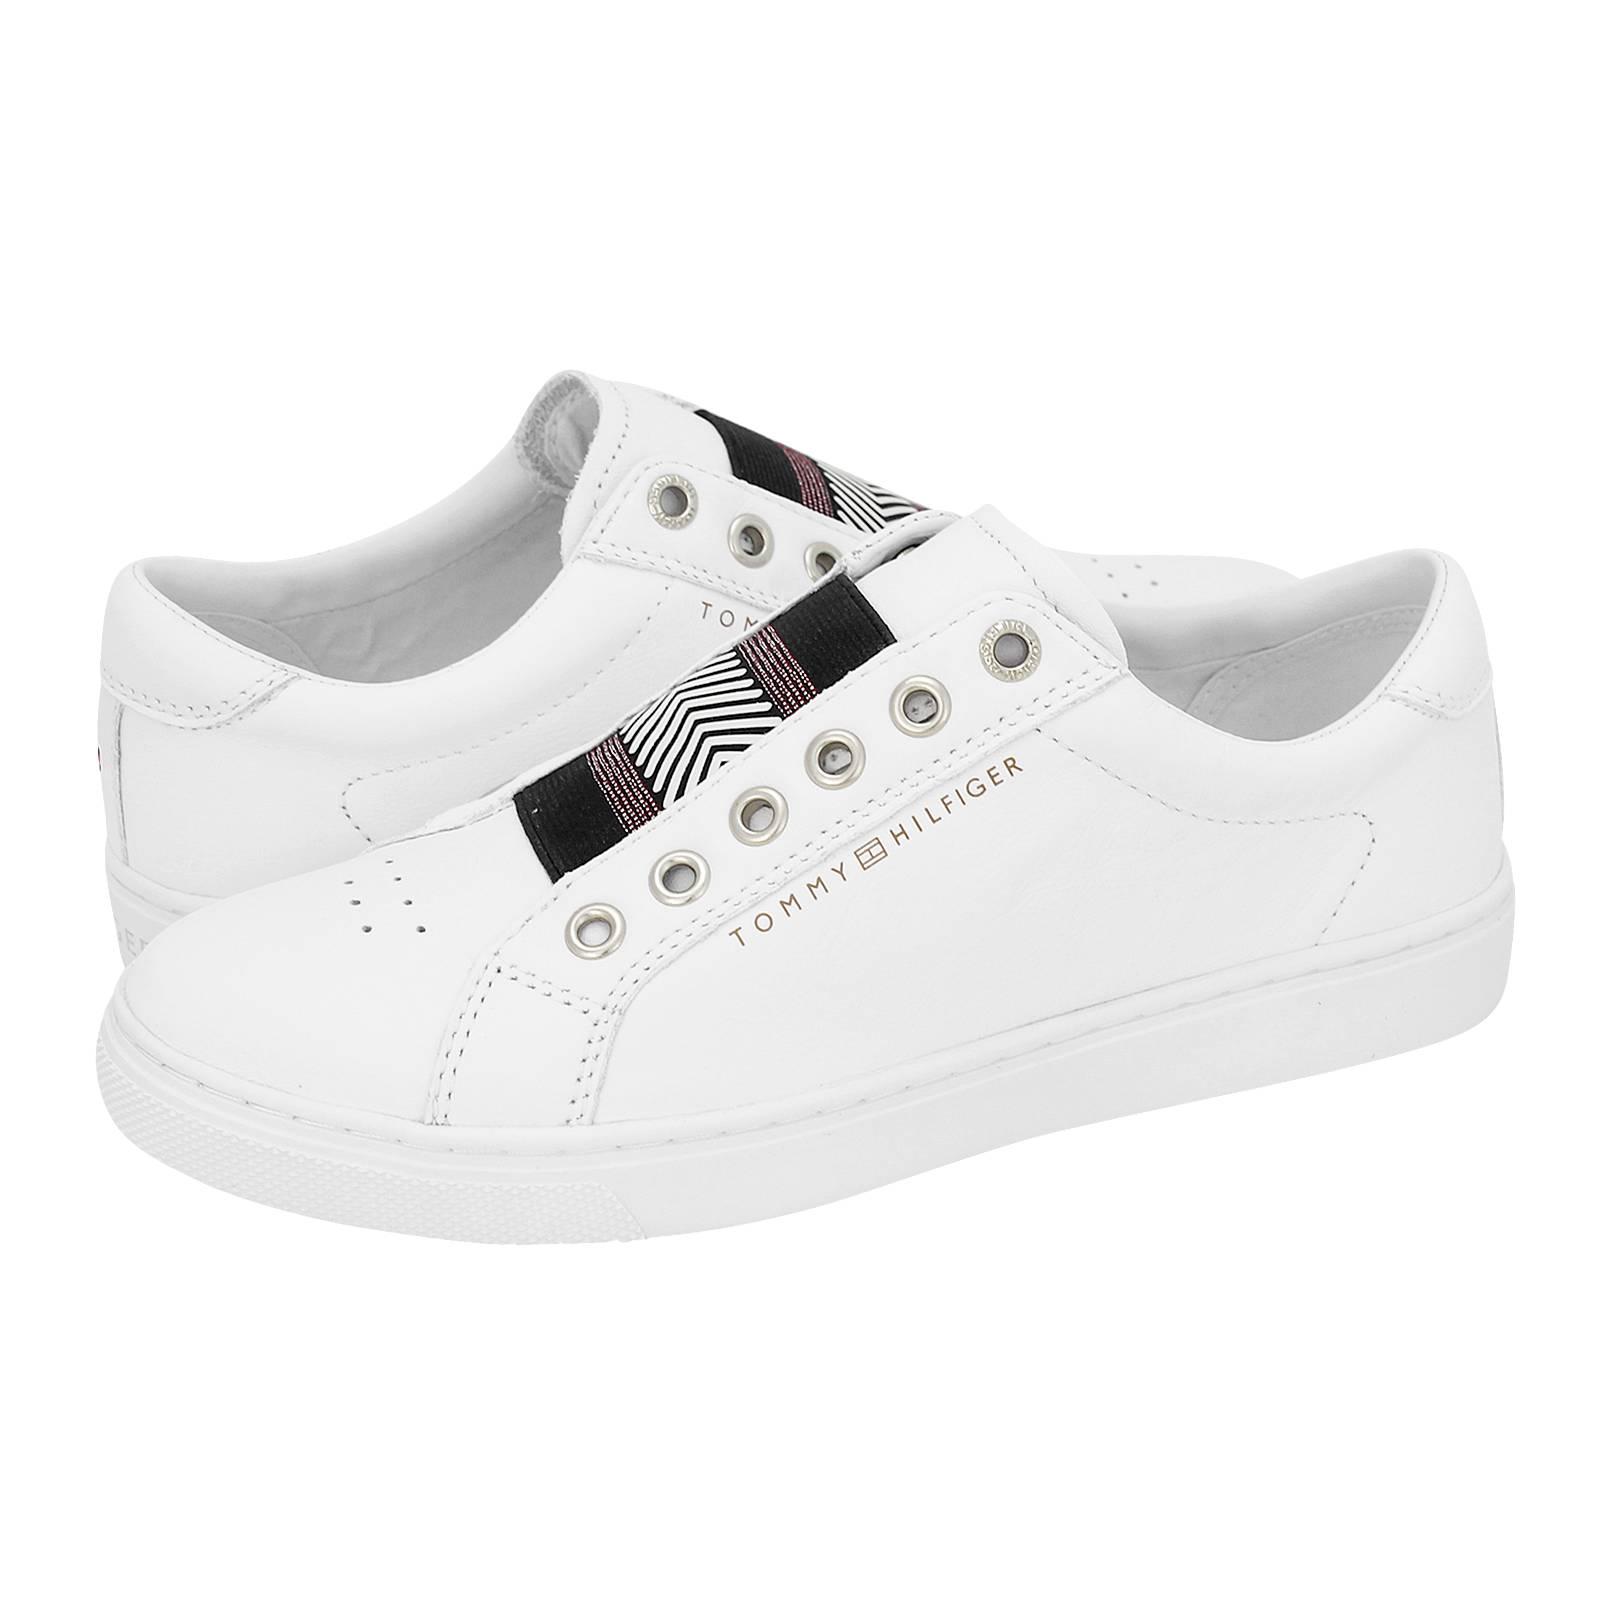 d0835a0c071 Iconic Metallic Elastic Sneaker - Γυναικεία παπούτσια casual Tommy ...